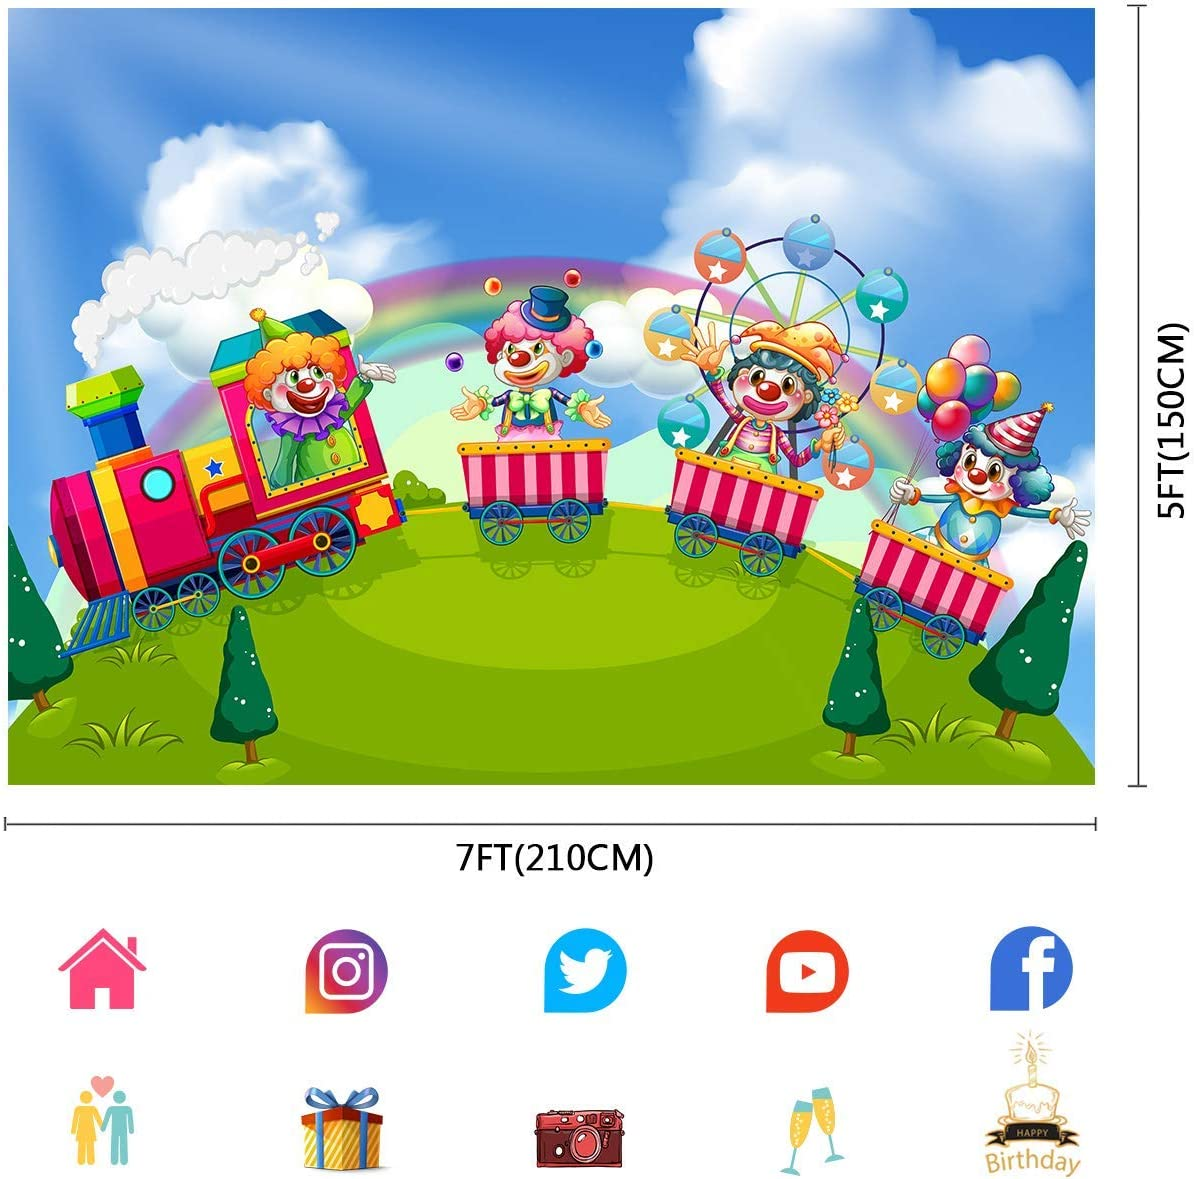 10x8ft Carnival Backdrop Amusement Park Train Clown Photography Backdrop for Children Baby Photo Background Props LYFU744